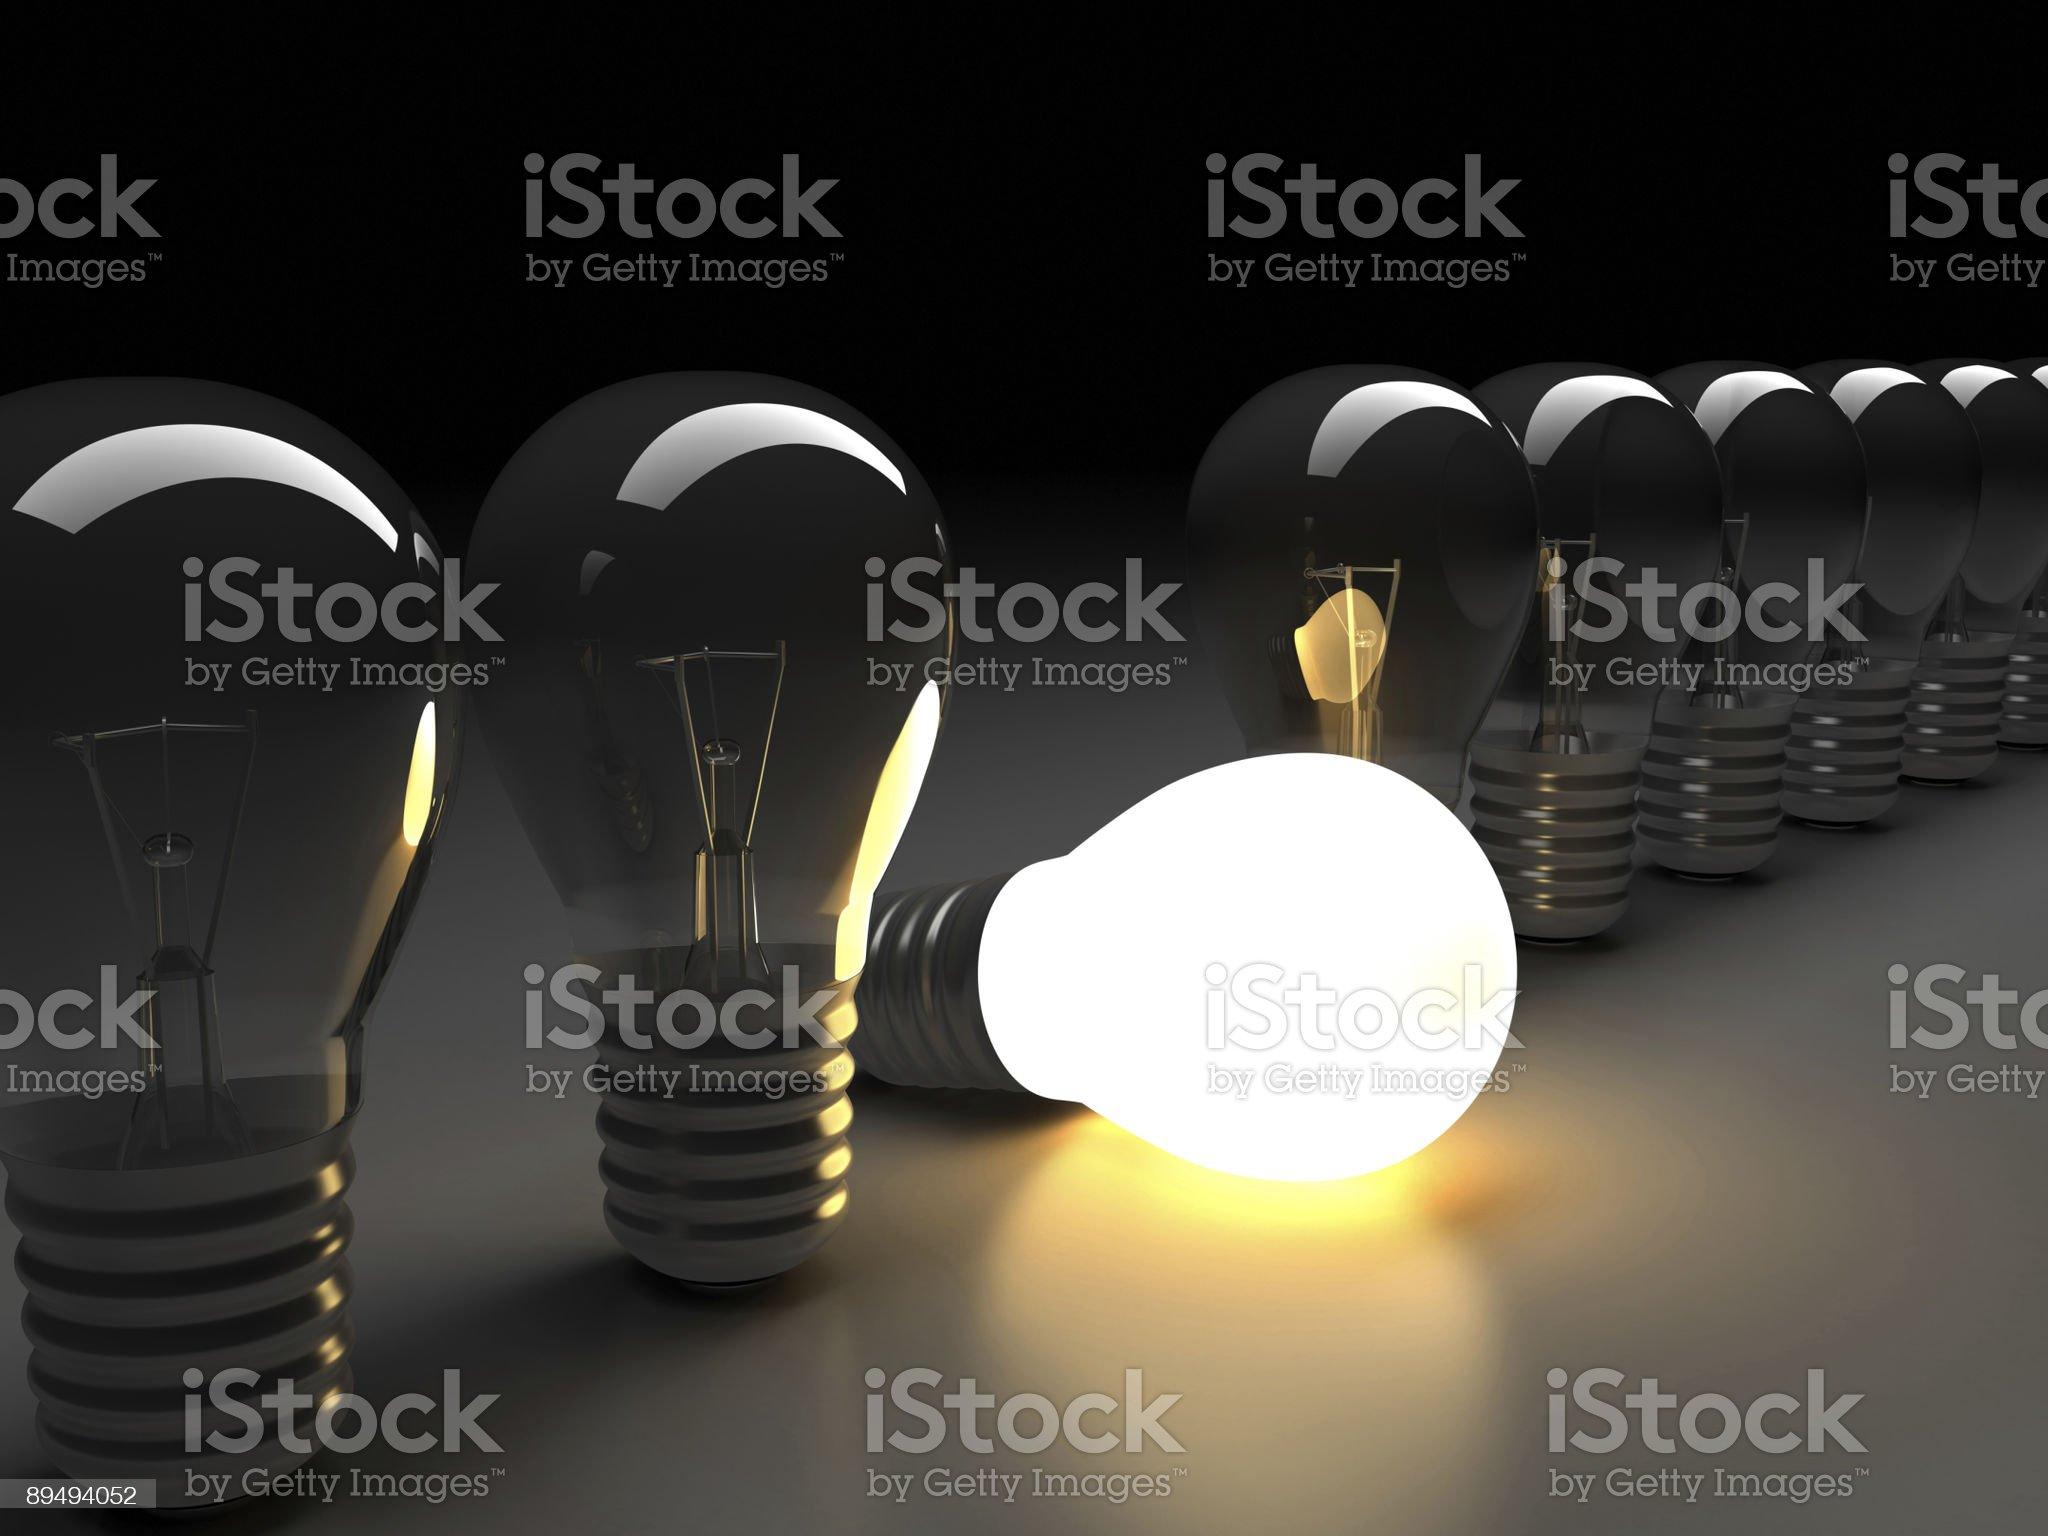 Light bulb clipart royalty-free stock photo